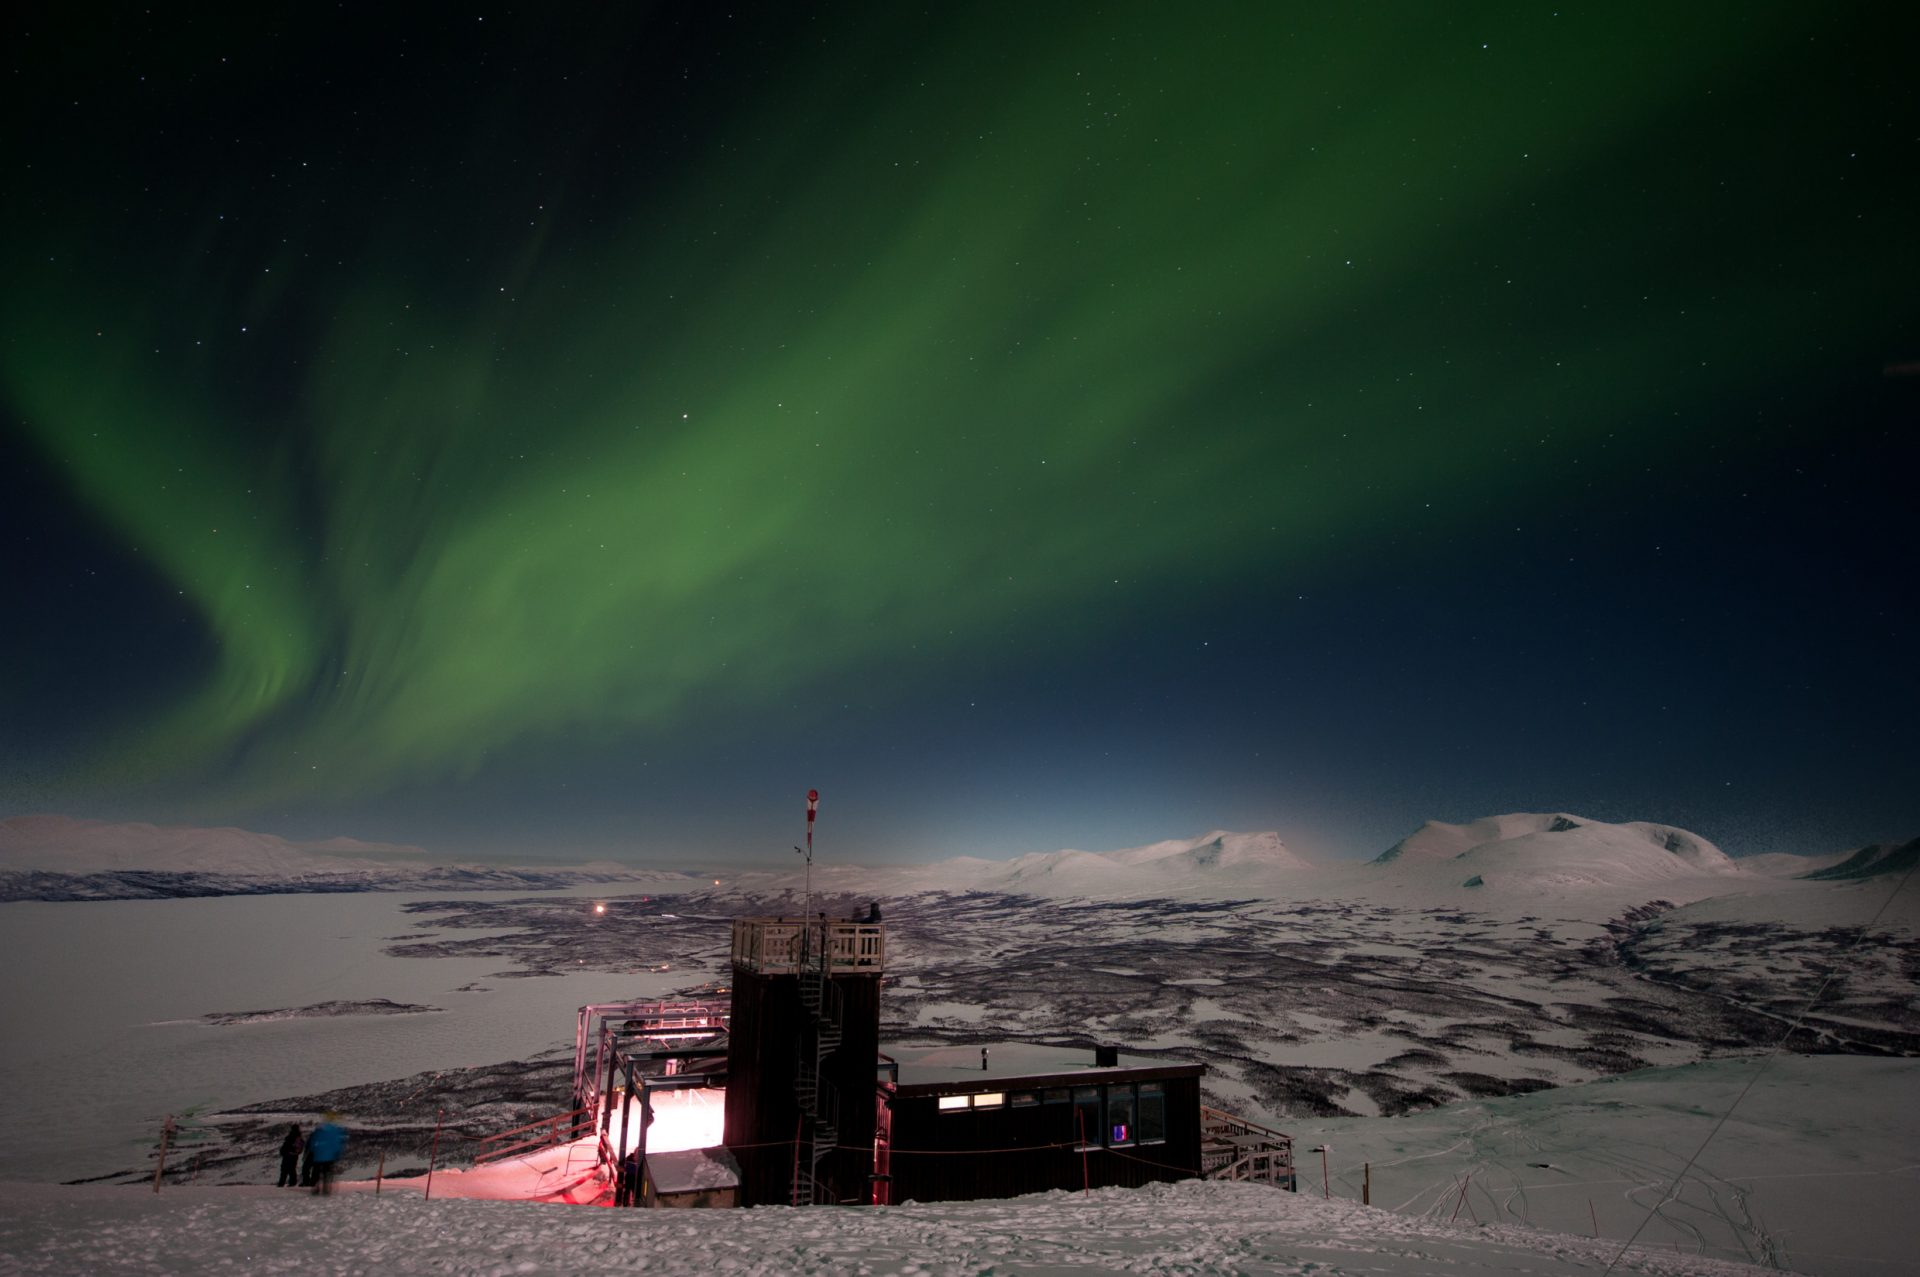 lola_akinmade_Akerstroem-northern_lights-2606